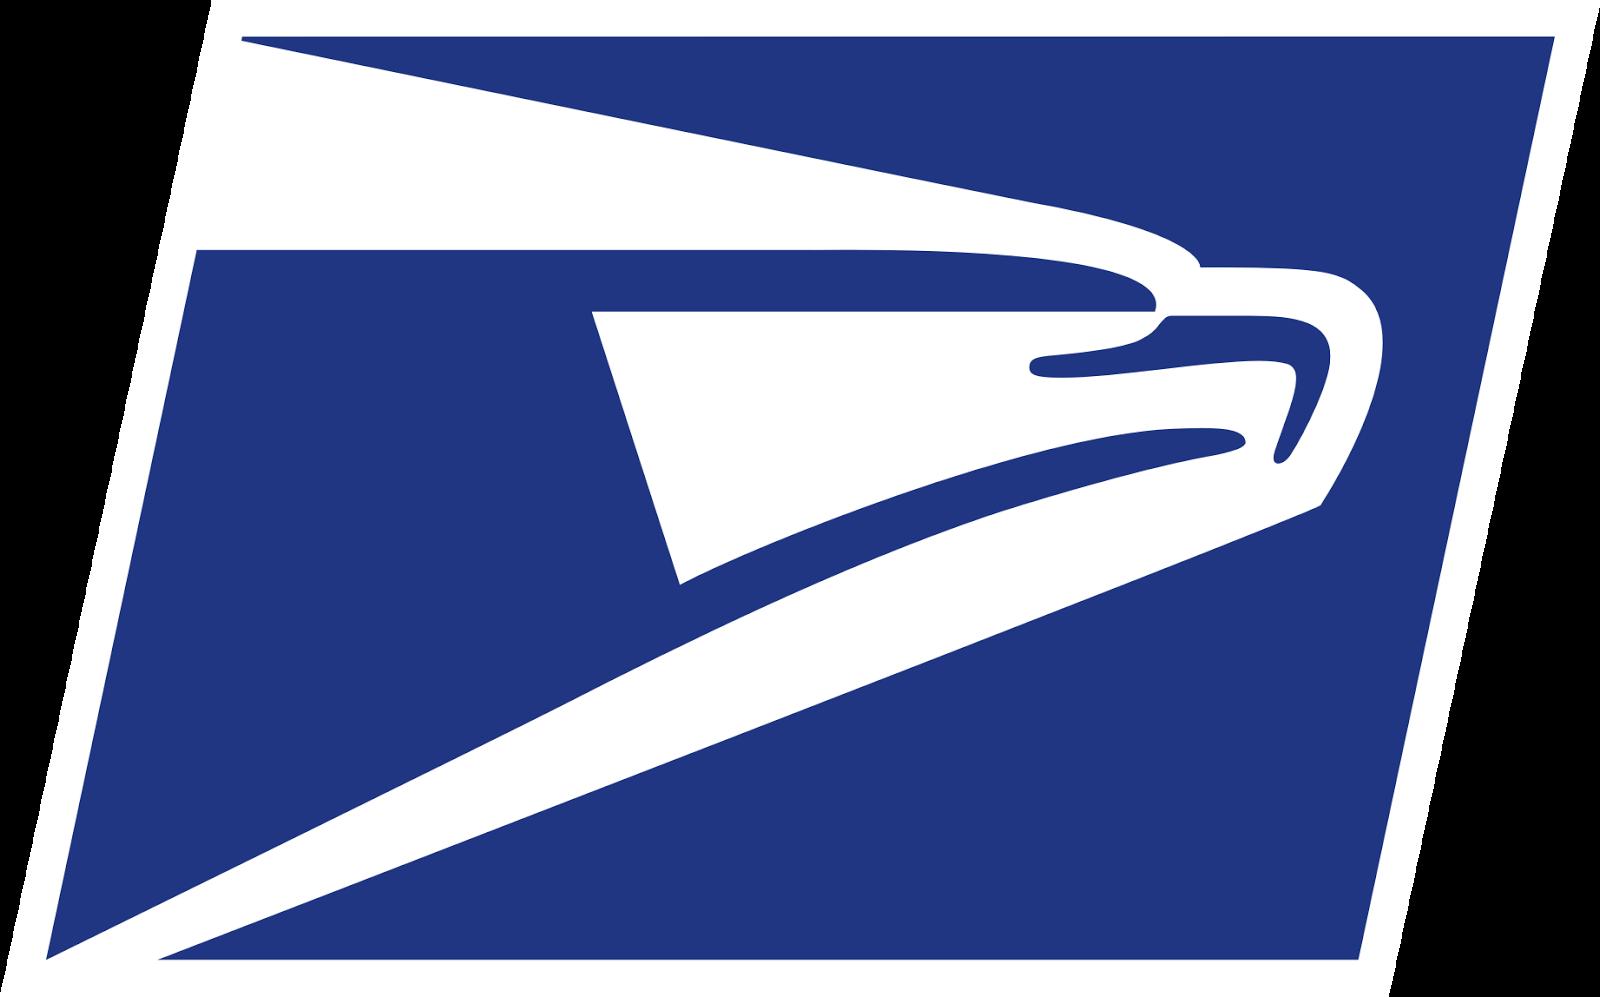 Mailbox clipart postal system, Mailbox postal system.